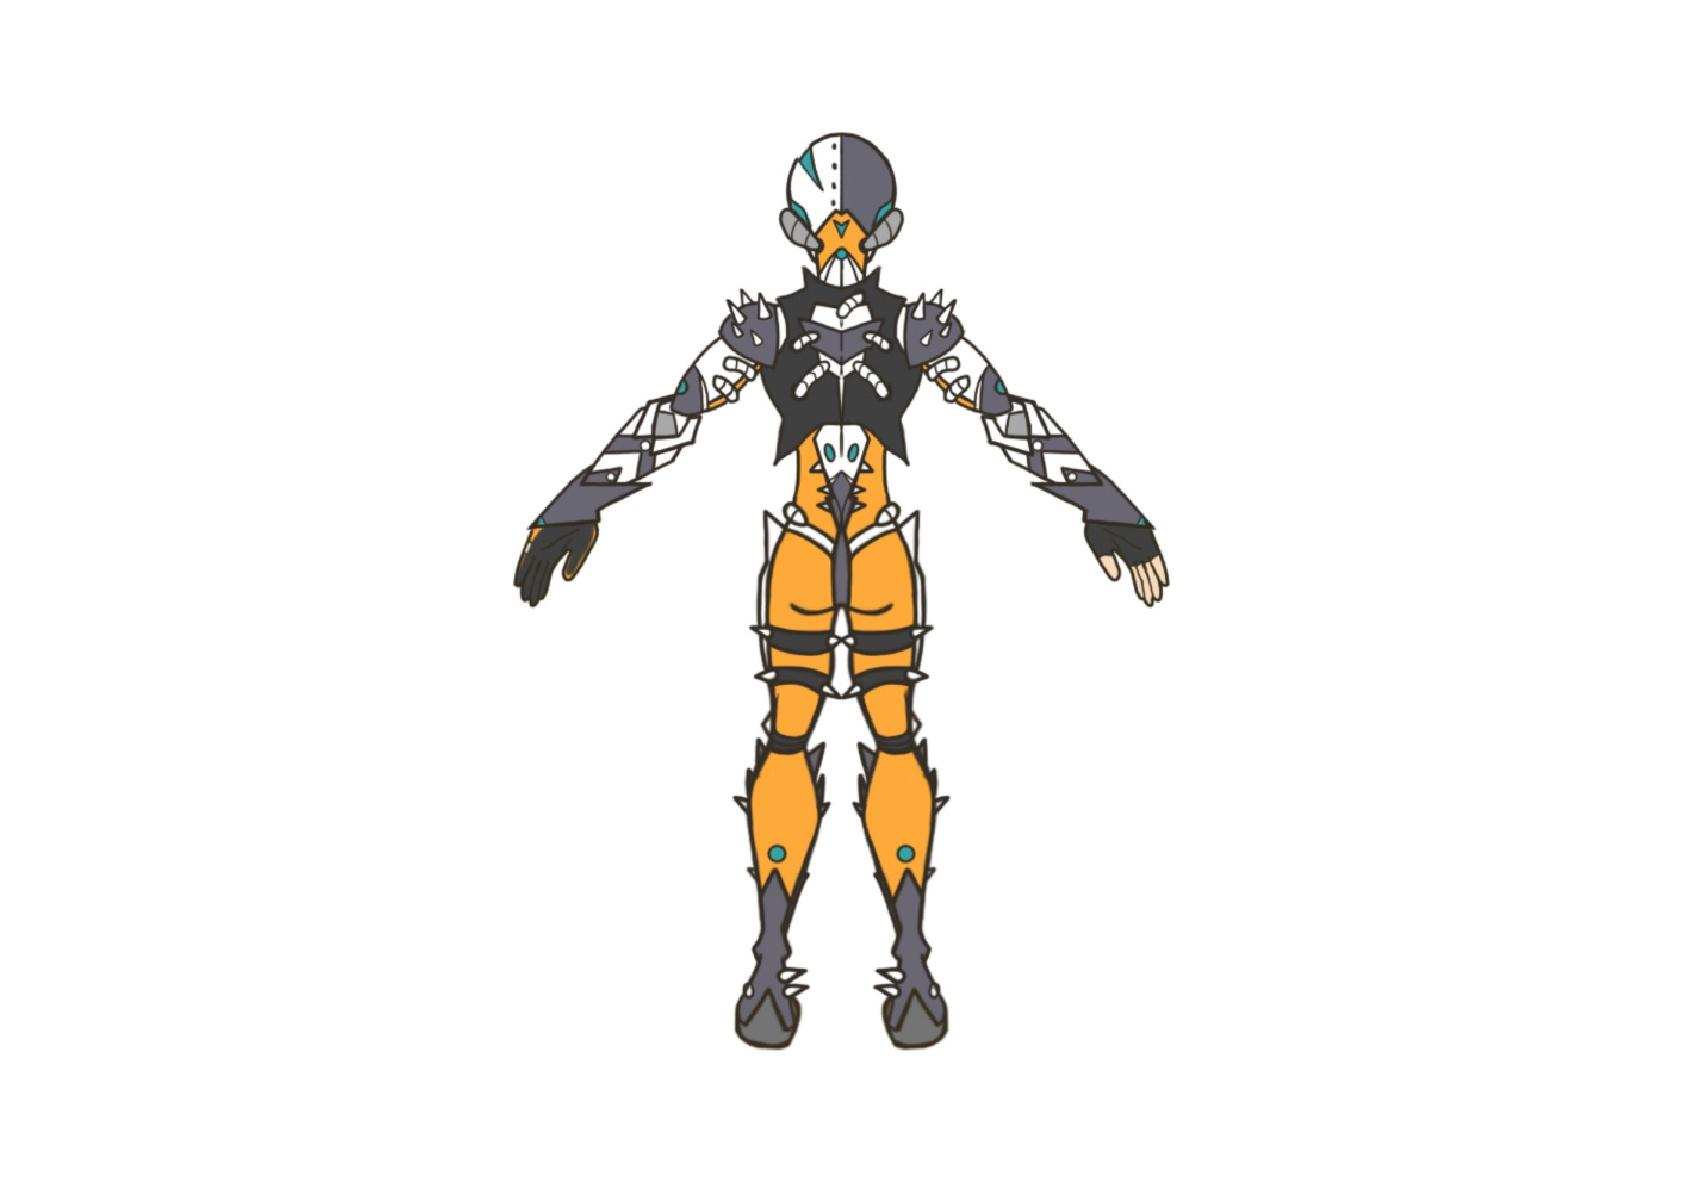 FINAL-CURSO-3d-MANISES--024